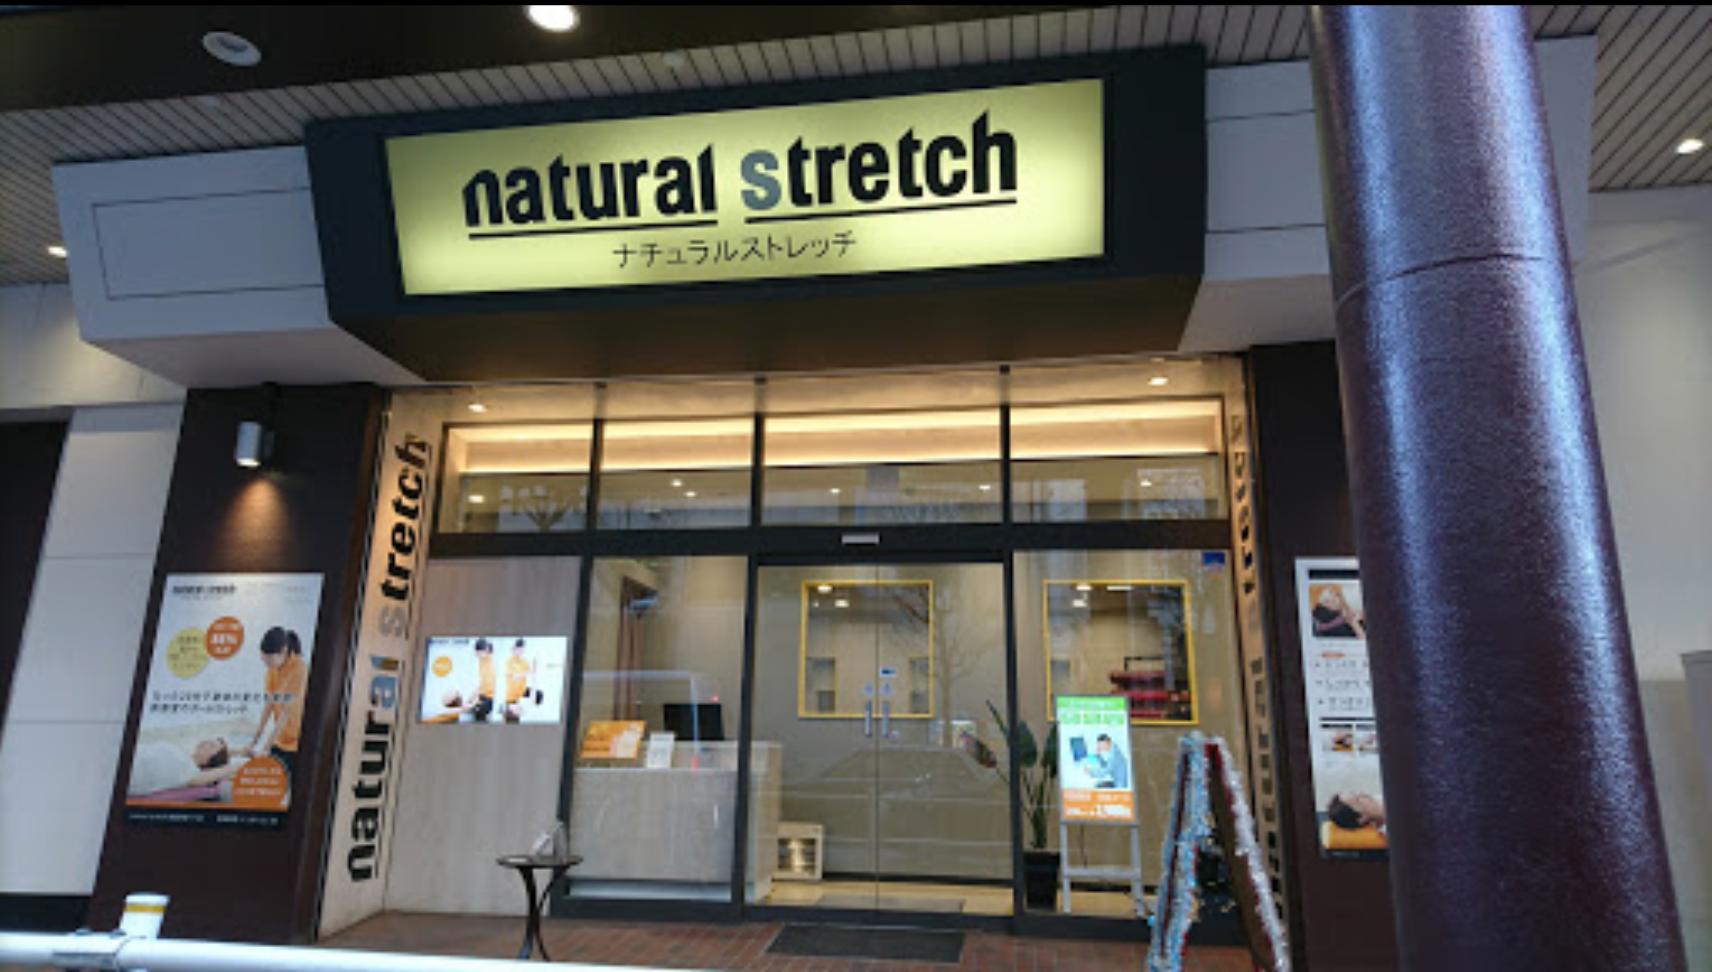 natural stretch西武新宿PePe店休業